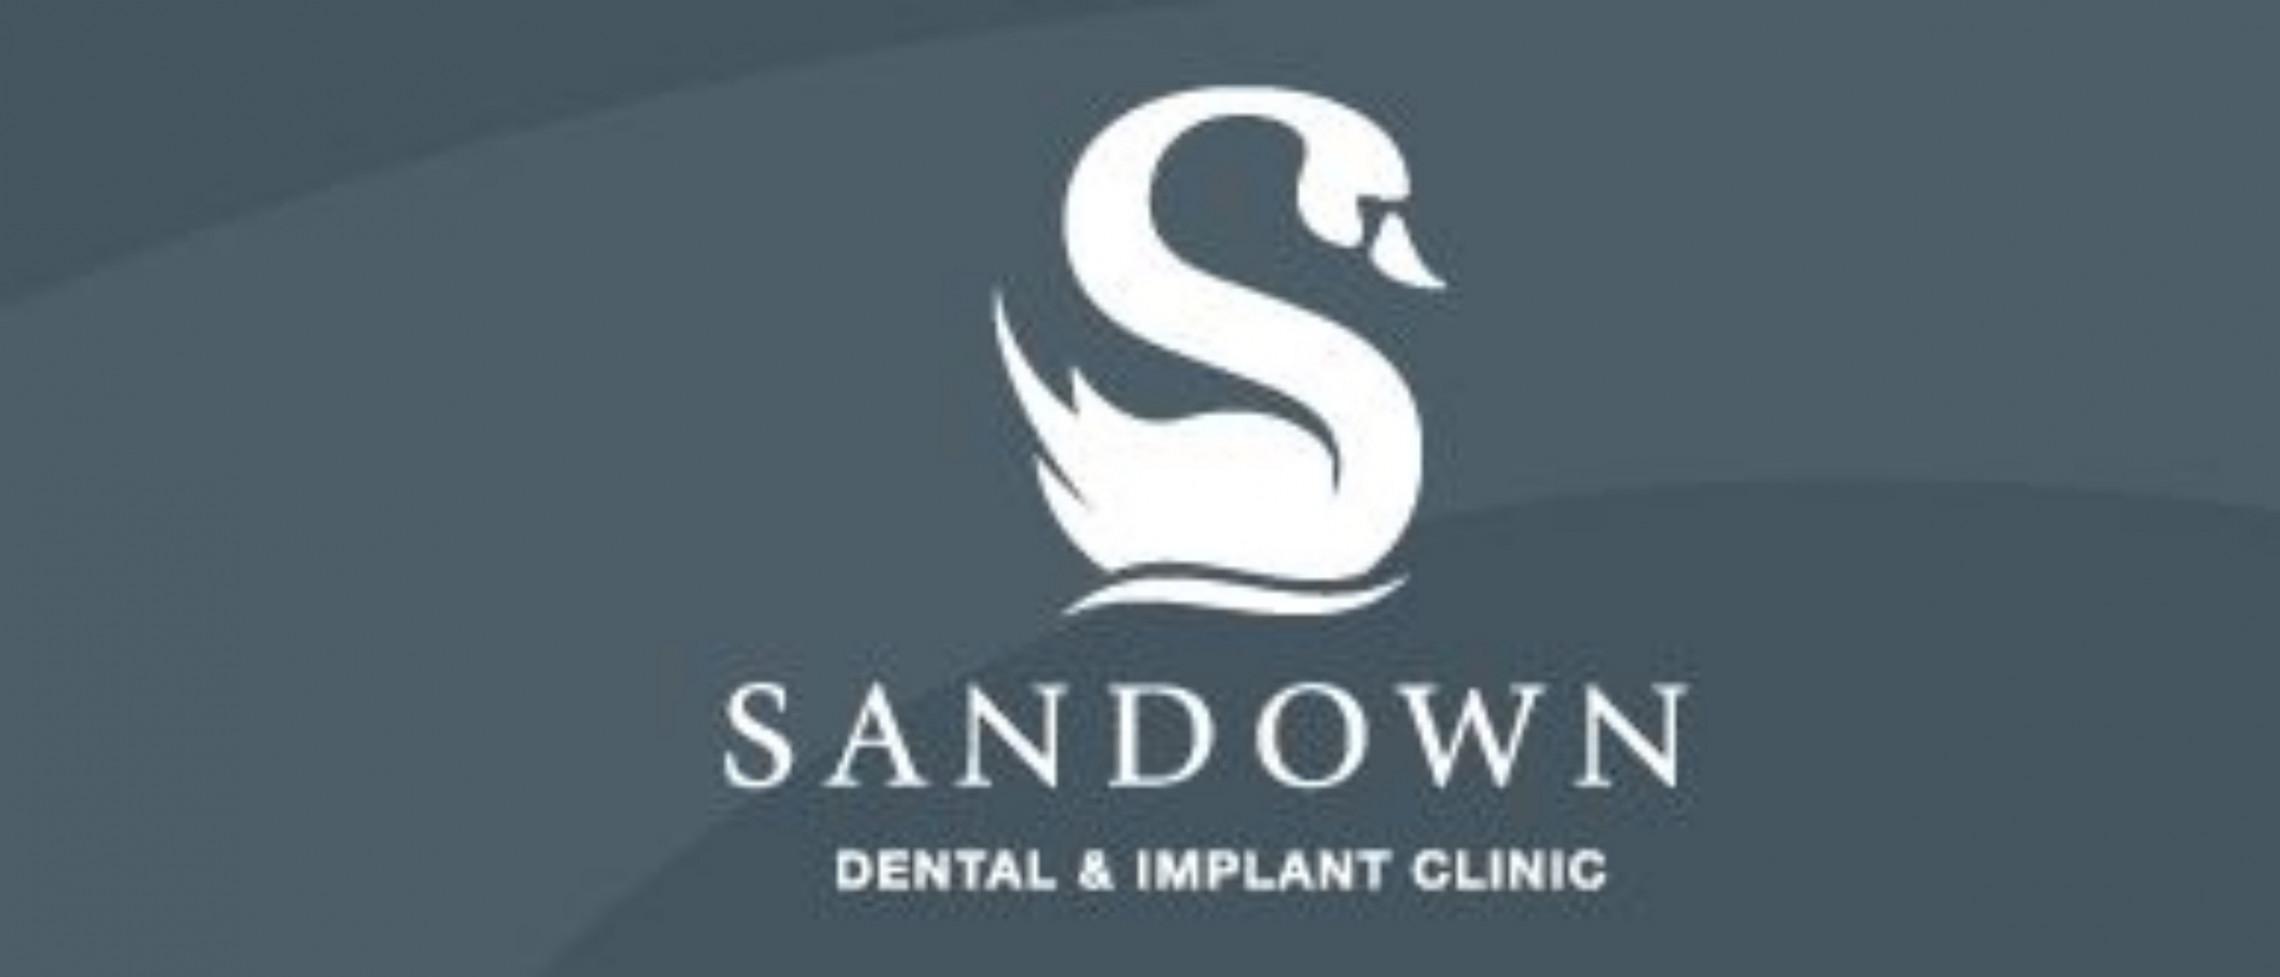 Sandown Dental and Implant Clinic